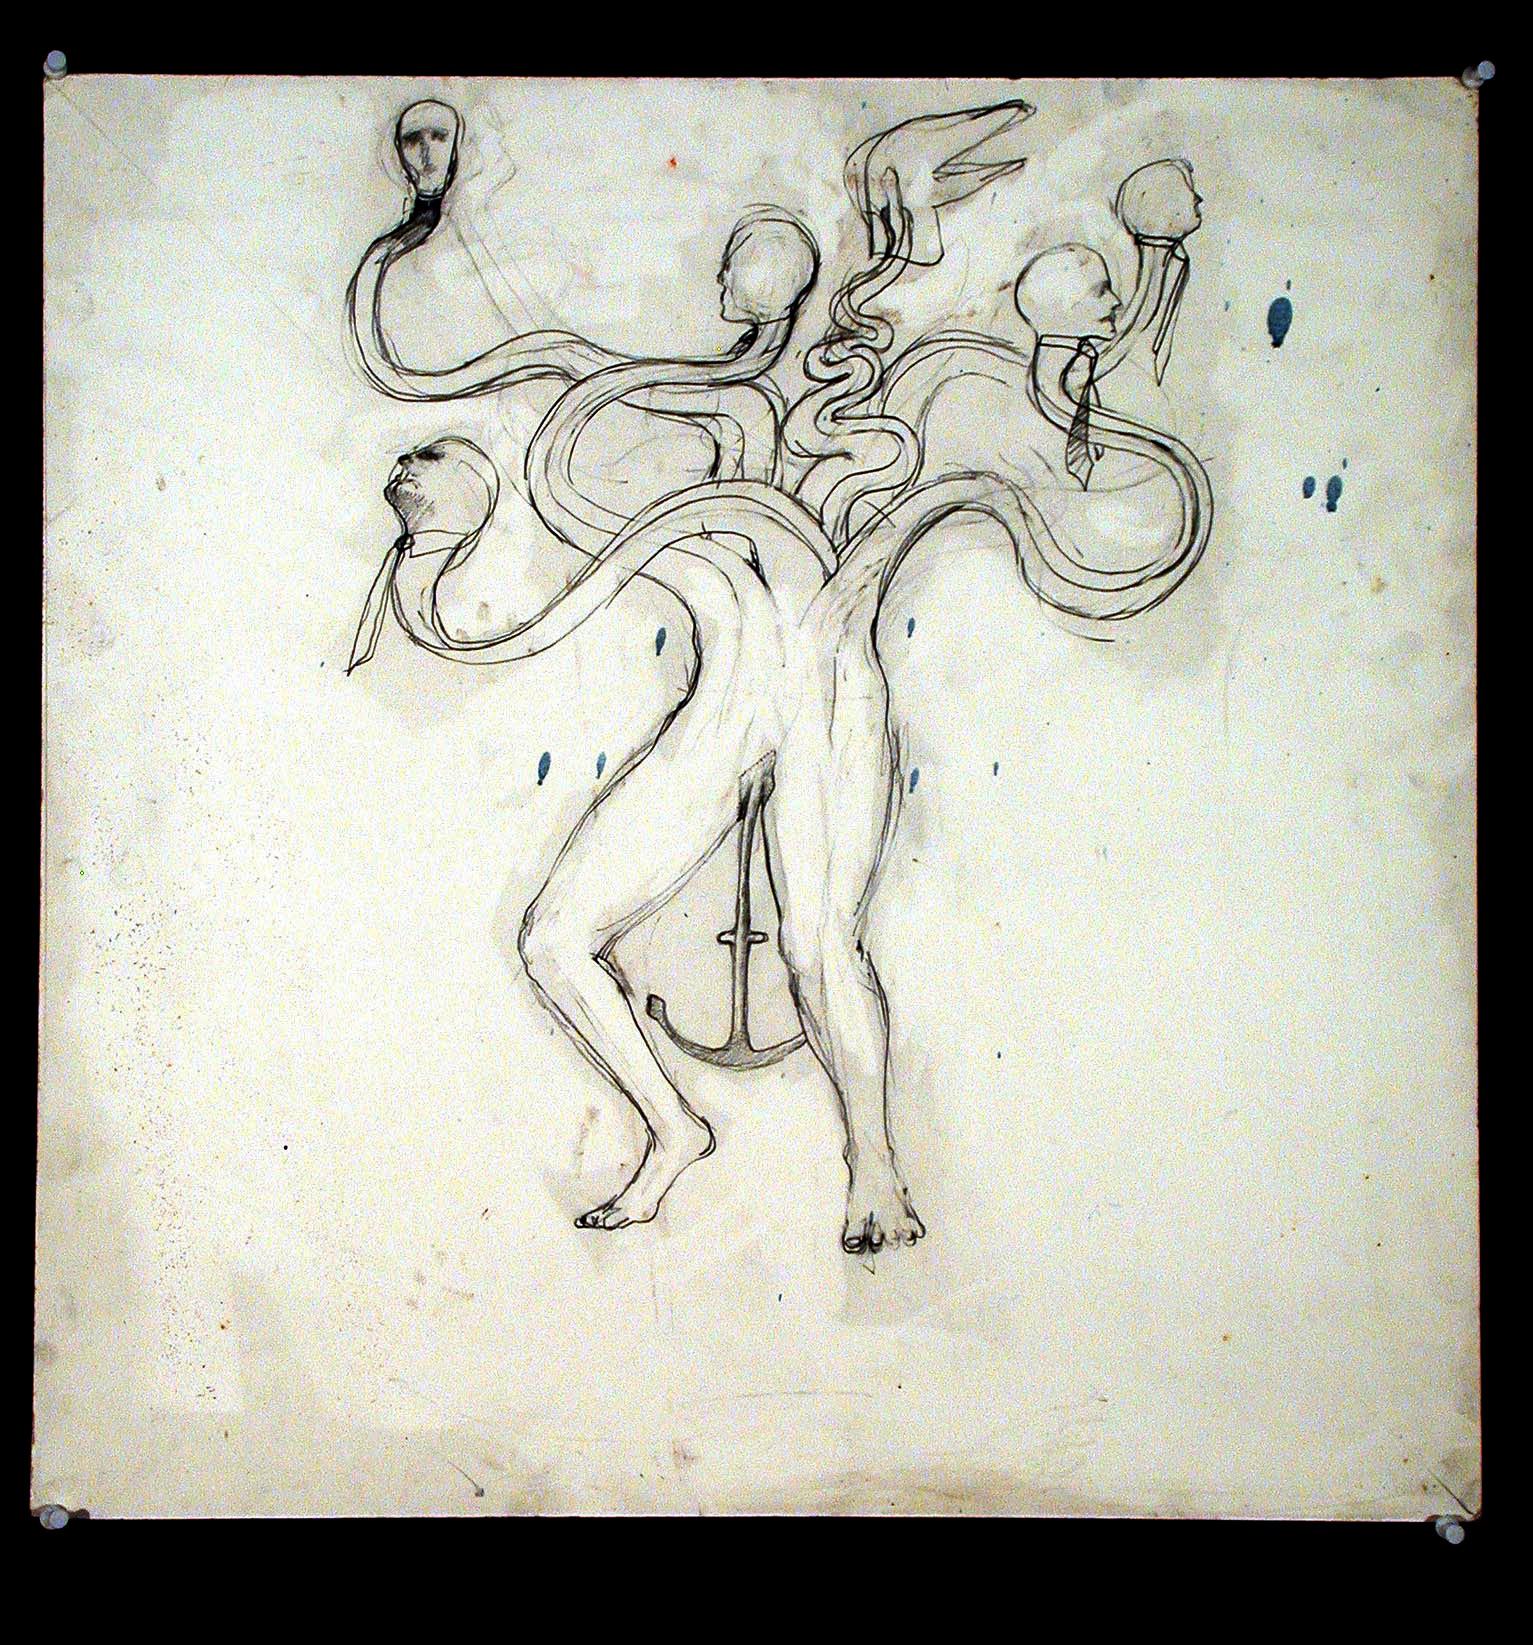 1979  Graphite on paper  20x18 in.